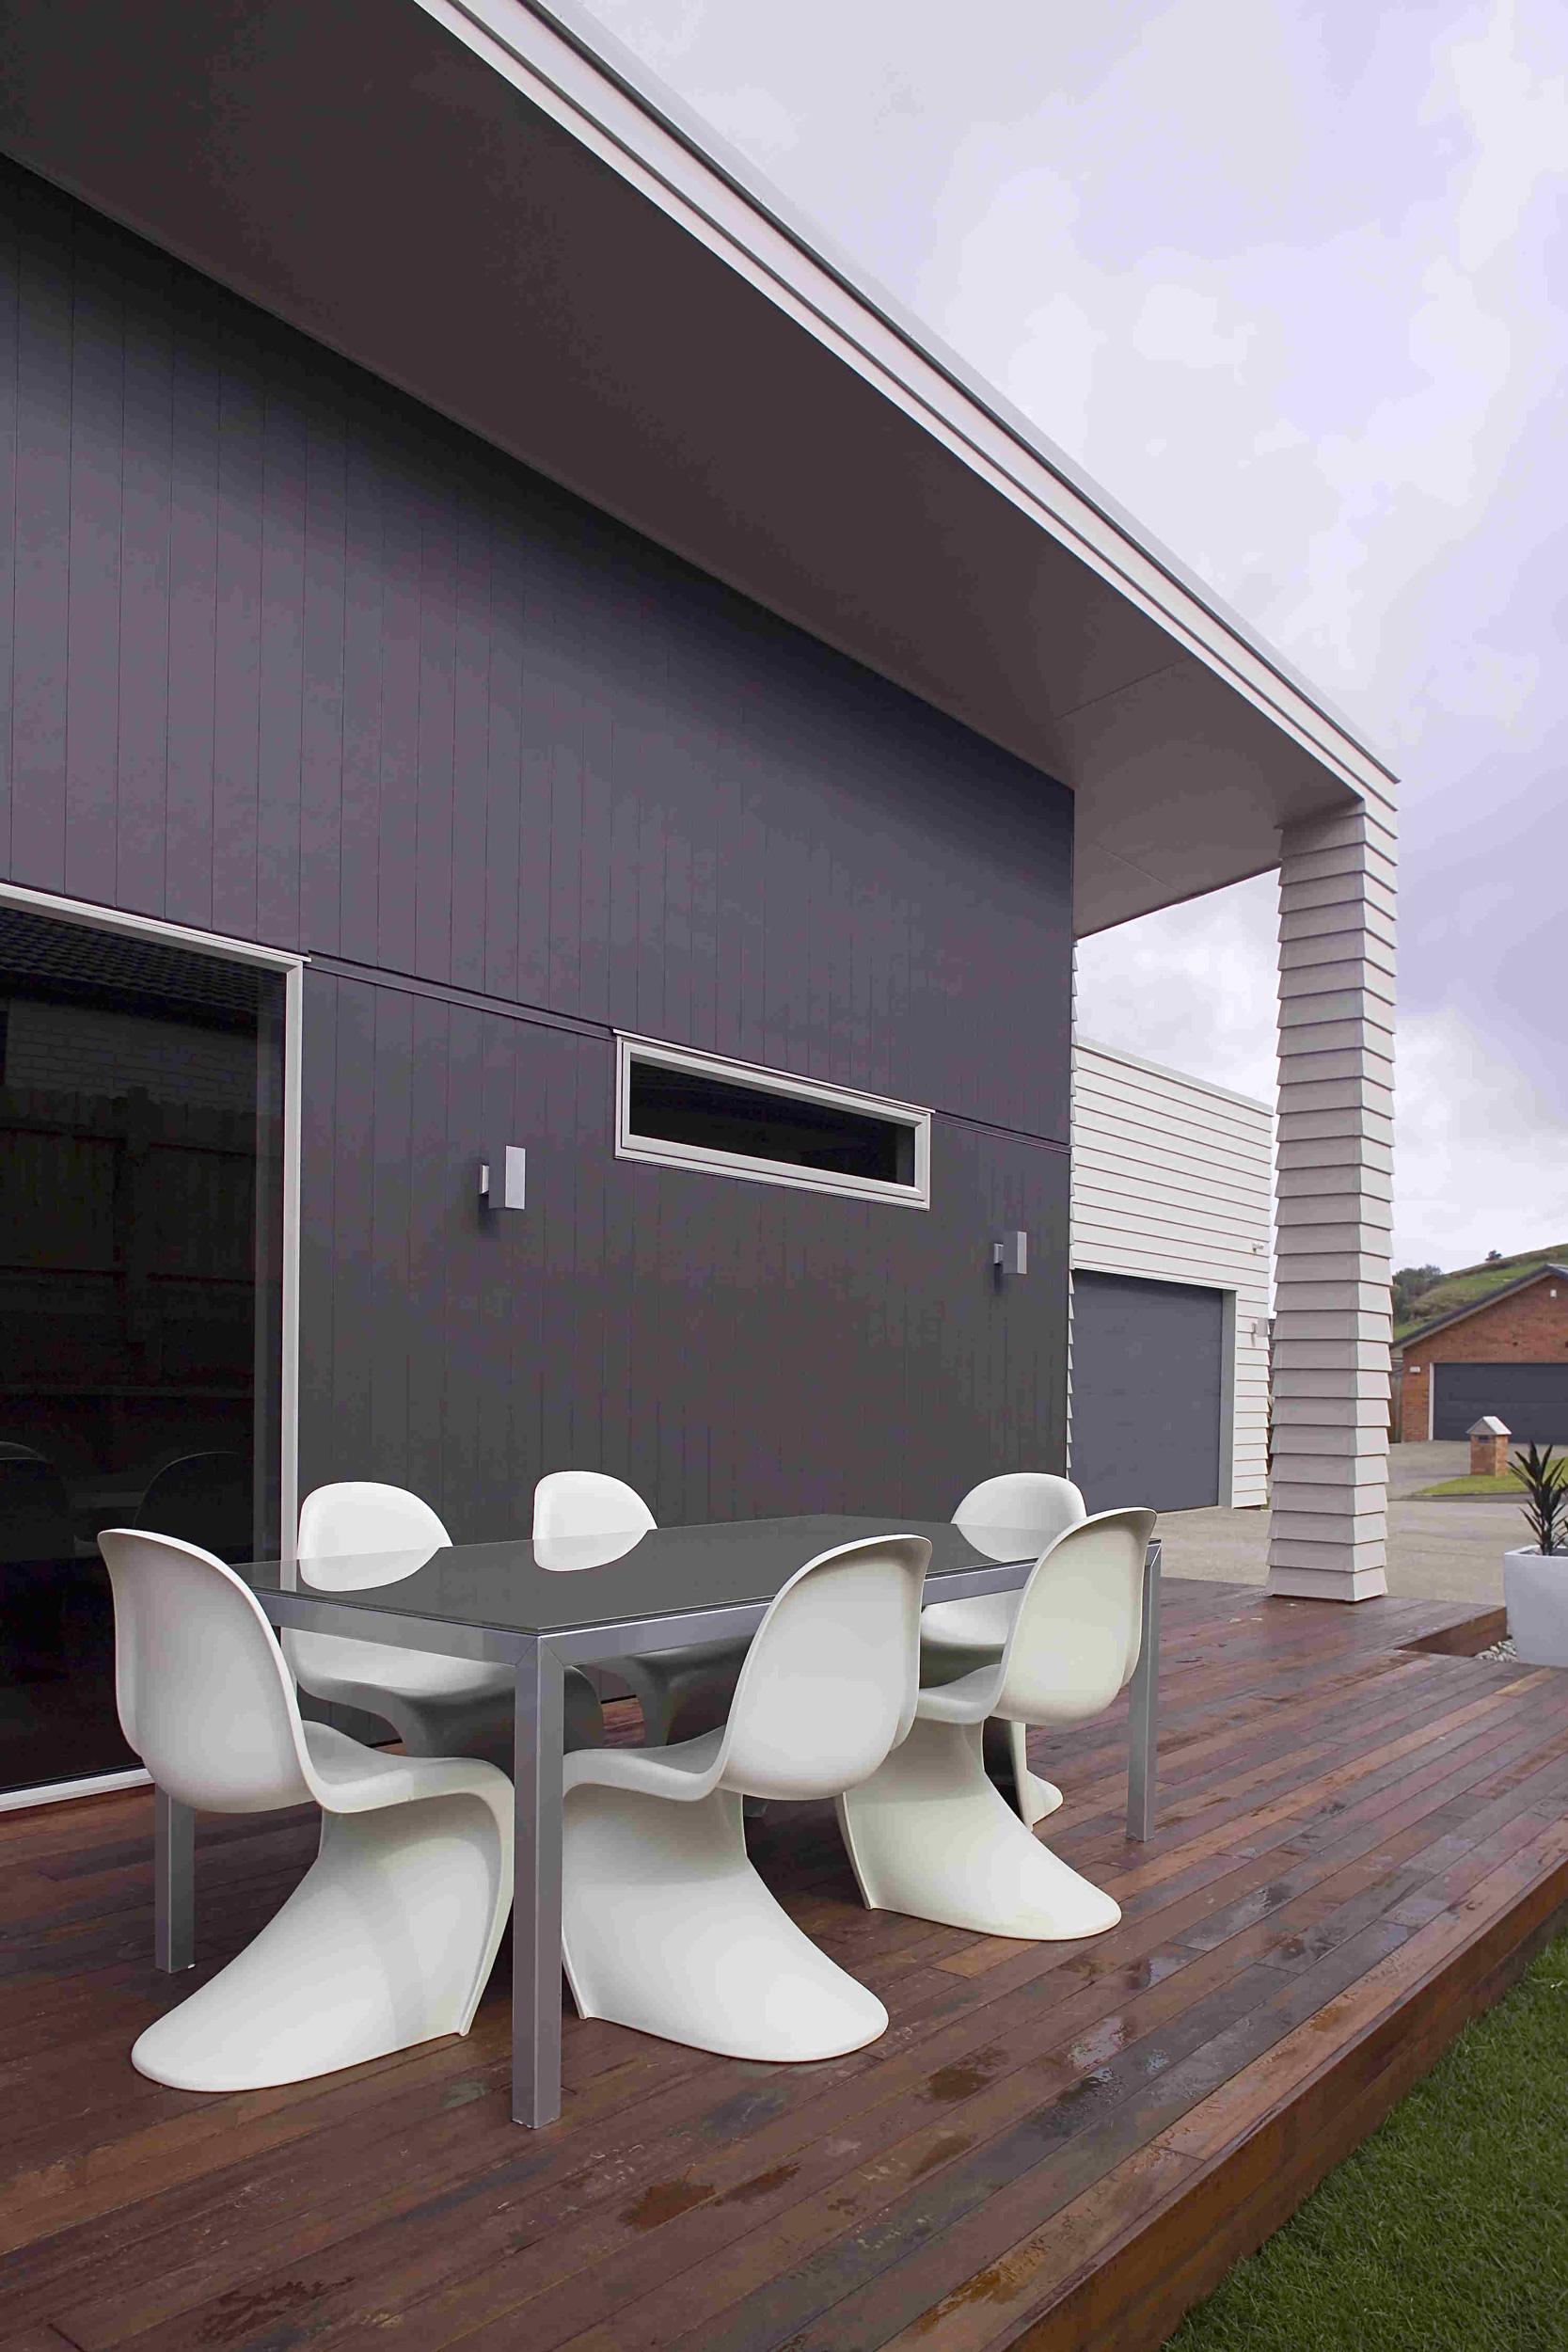 haven-builder-residential-les-fisher-3.jpg